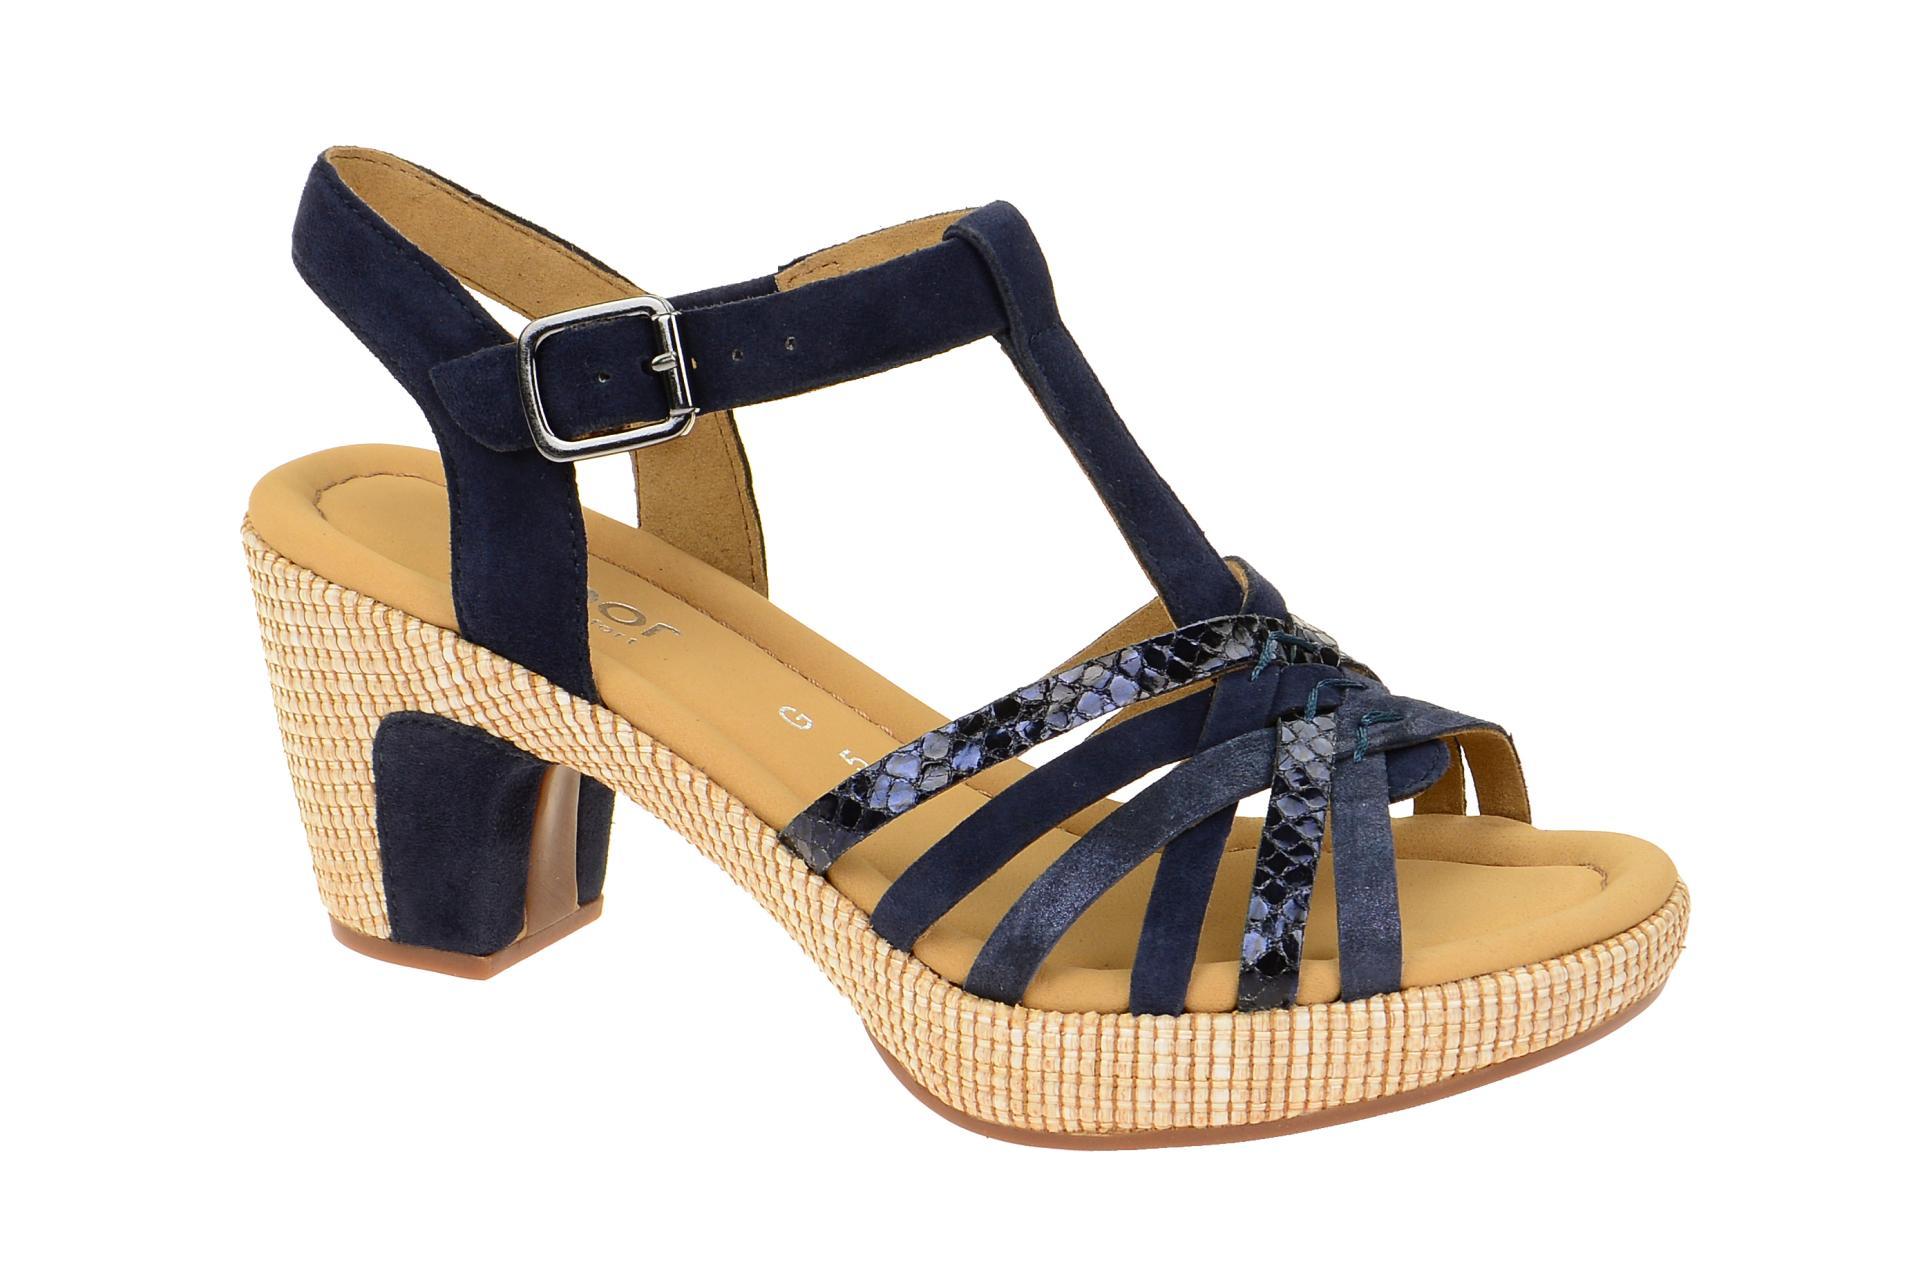 Schuhe gabor blau